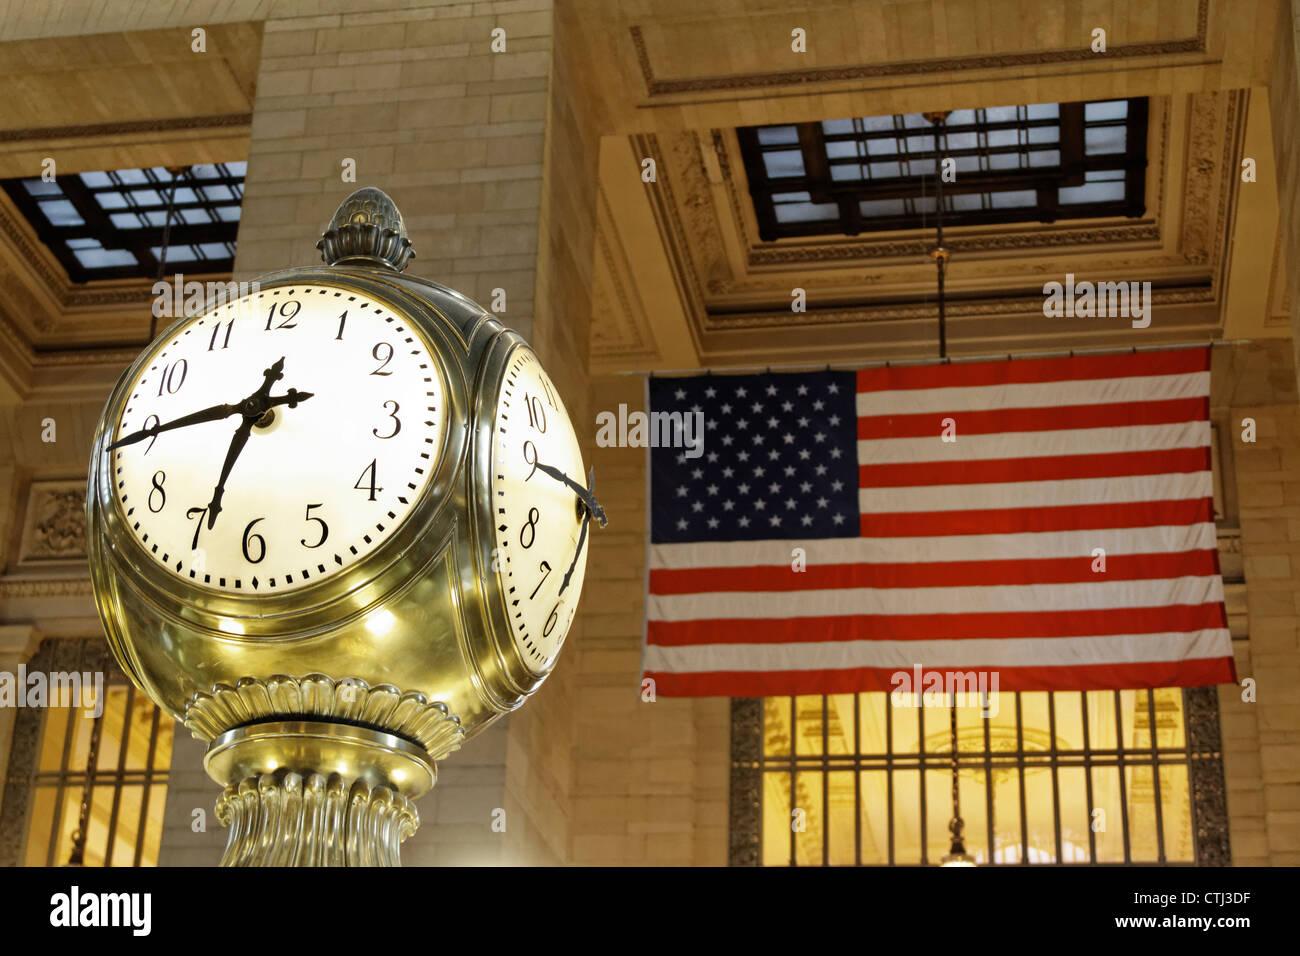 Clock at Grand Central station, Manhattan, New York - Stock Image